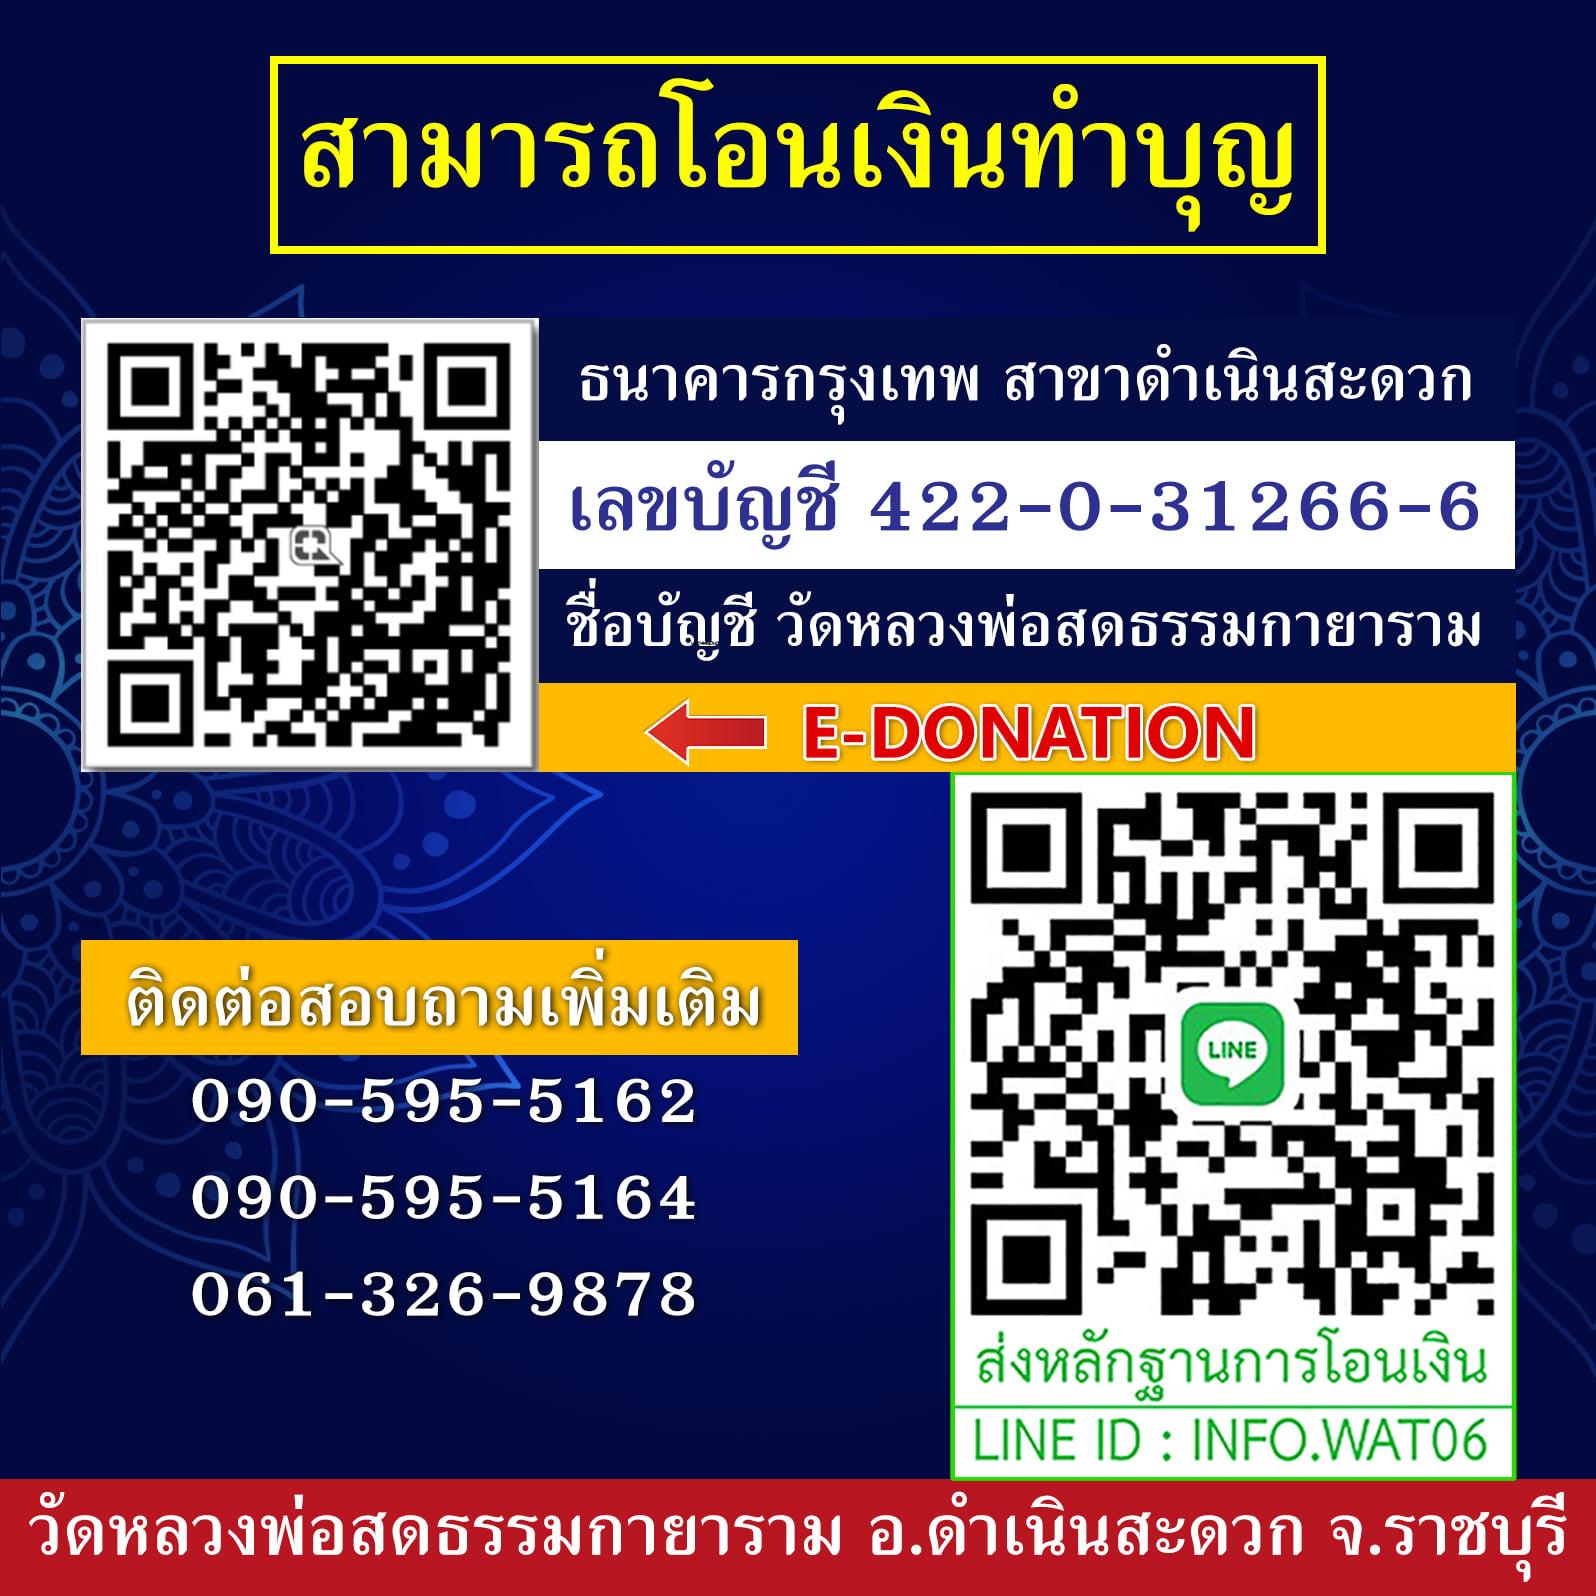 131005412_1559391214262045_1178078595971516431_o